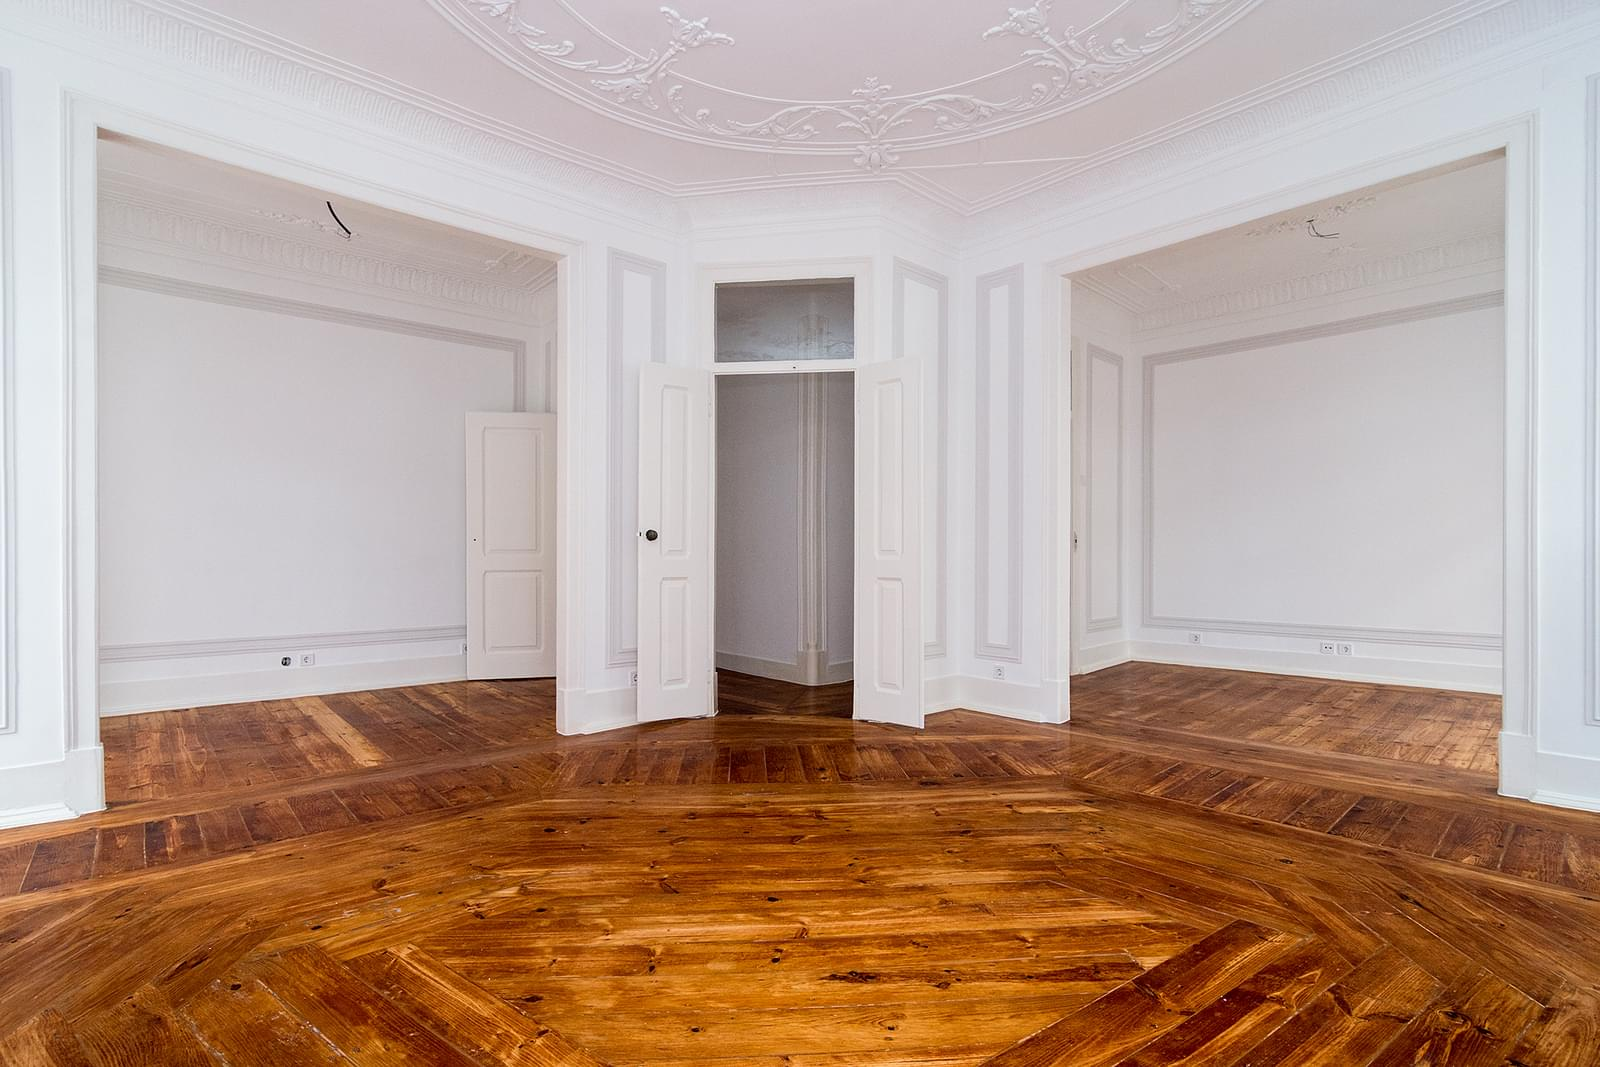 pf17267-apartamento-t3-lisboa-296d6eeb-20da-4f18-a032-ff9cf0a403a5